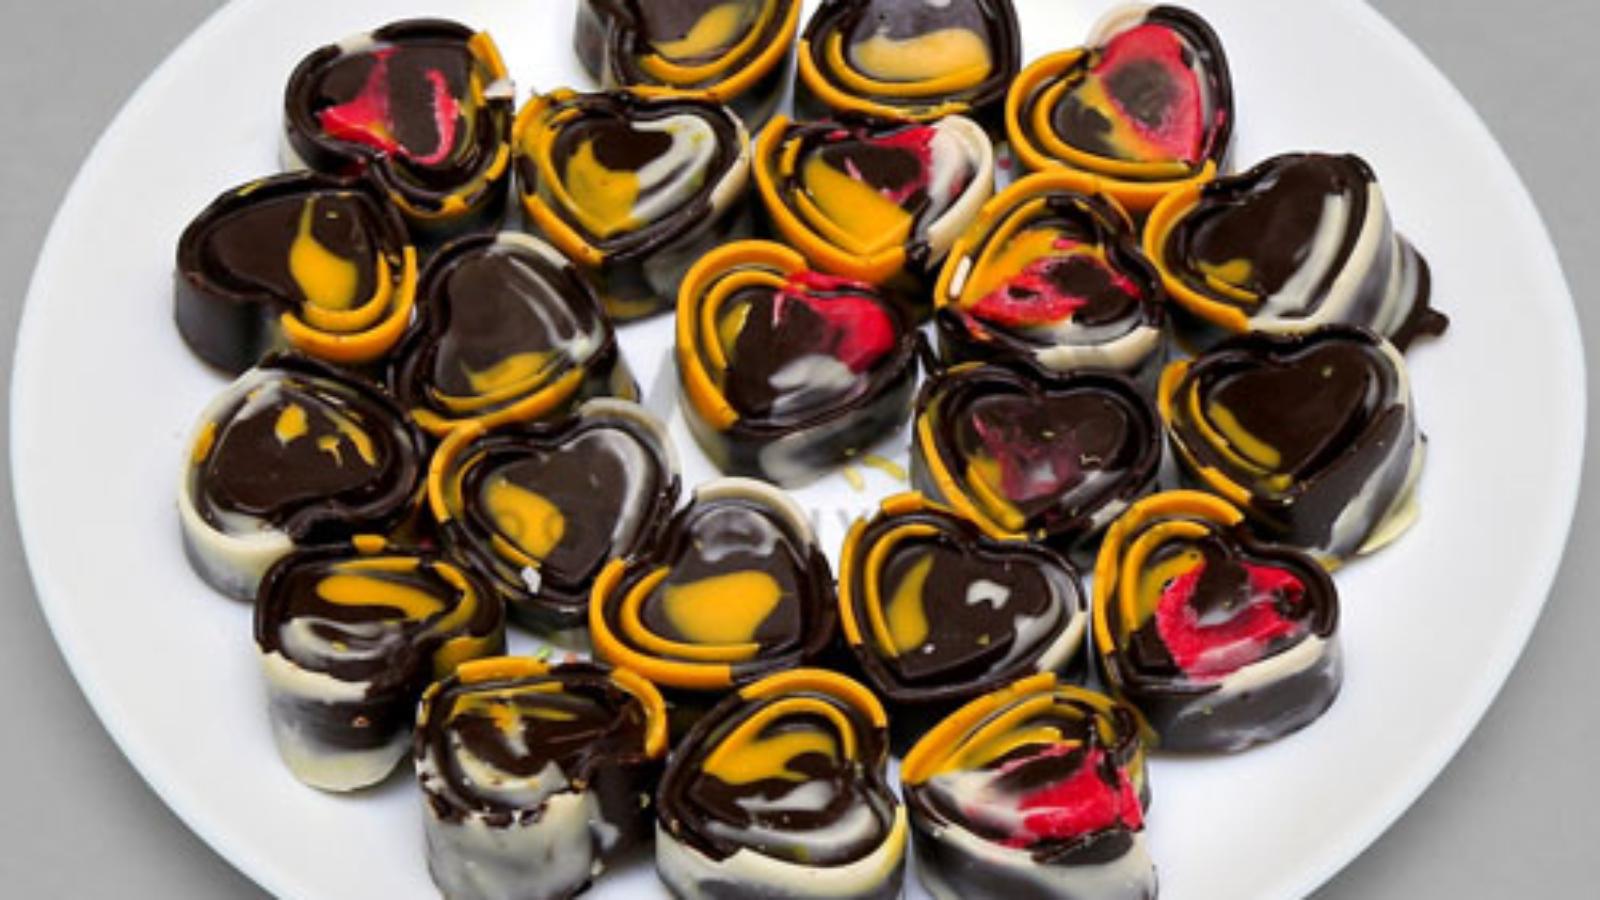 Colourful-Designed-Chocolates